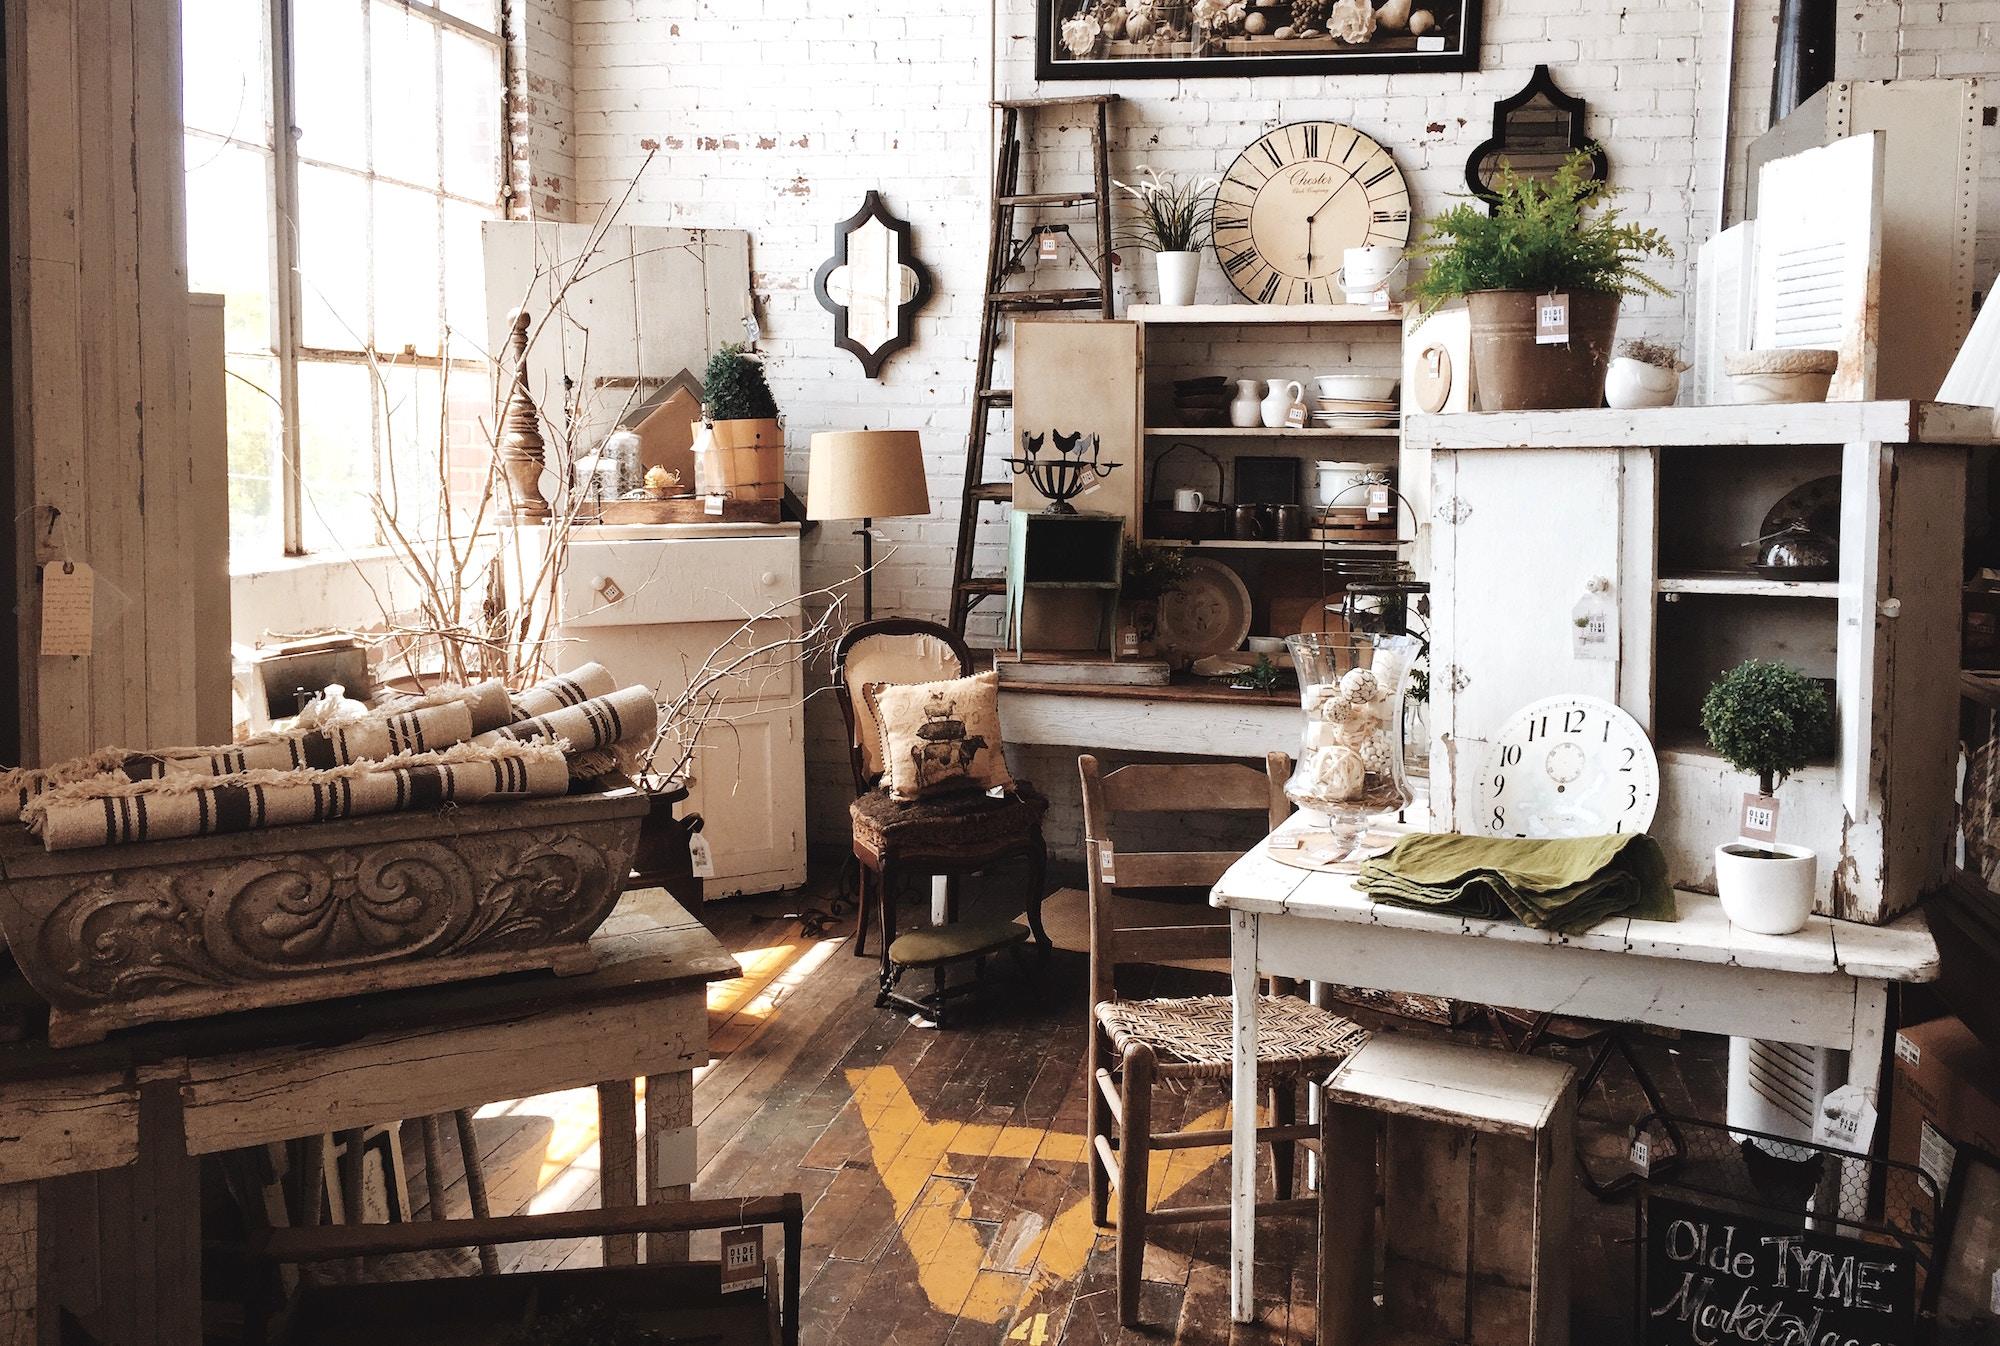 esprit maison de campagne que chiner en brocante d co id es. Black Bedroom Furniture Sets. Home Design Ideas